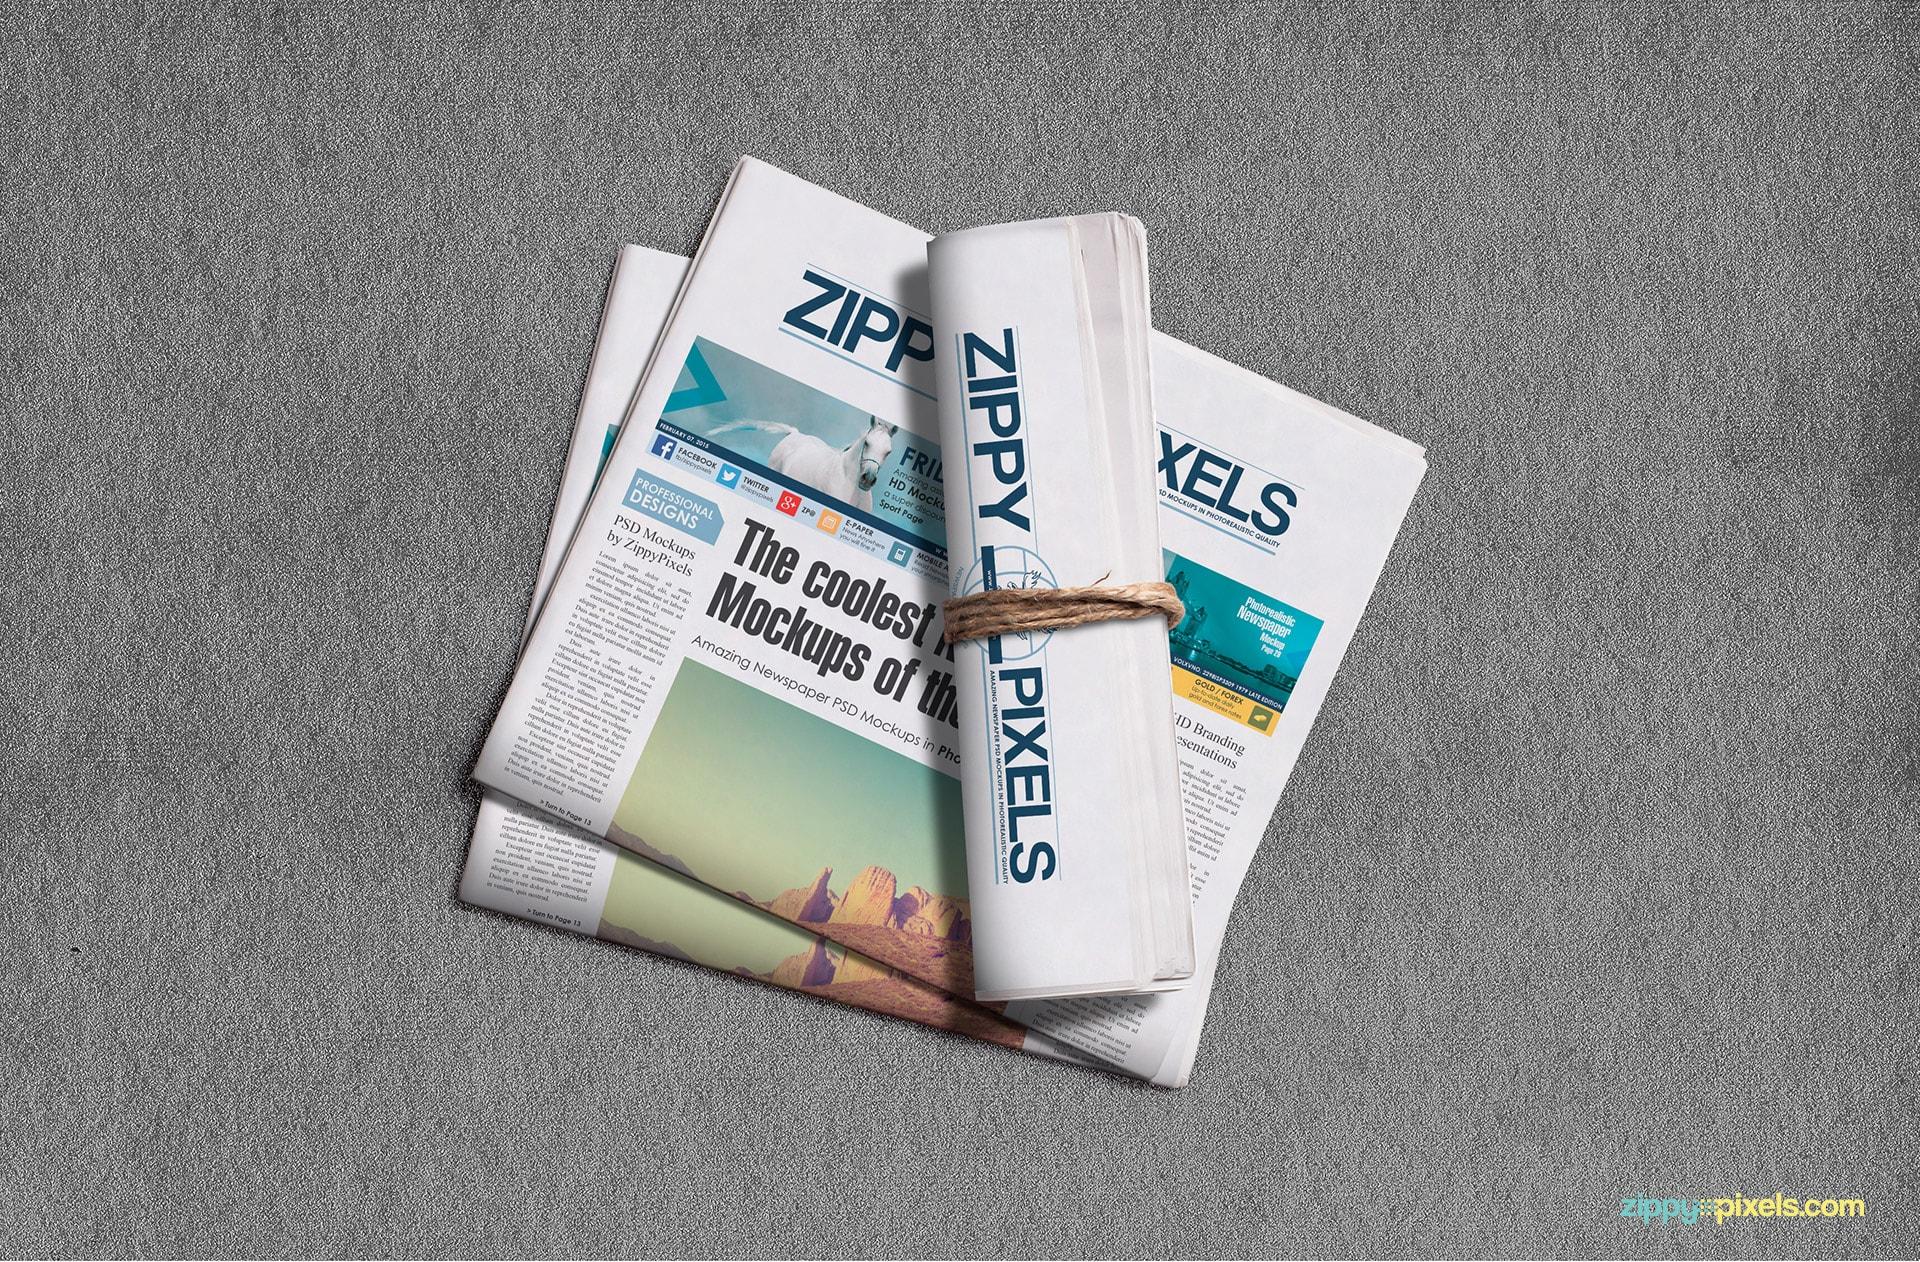 Newspaper roll lying on two half-fold broadsheet newspapers